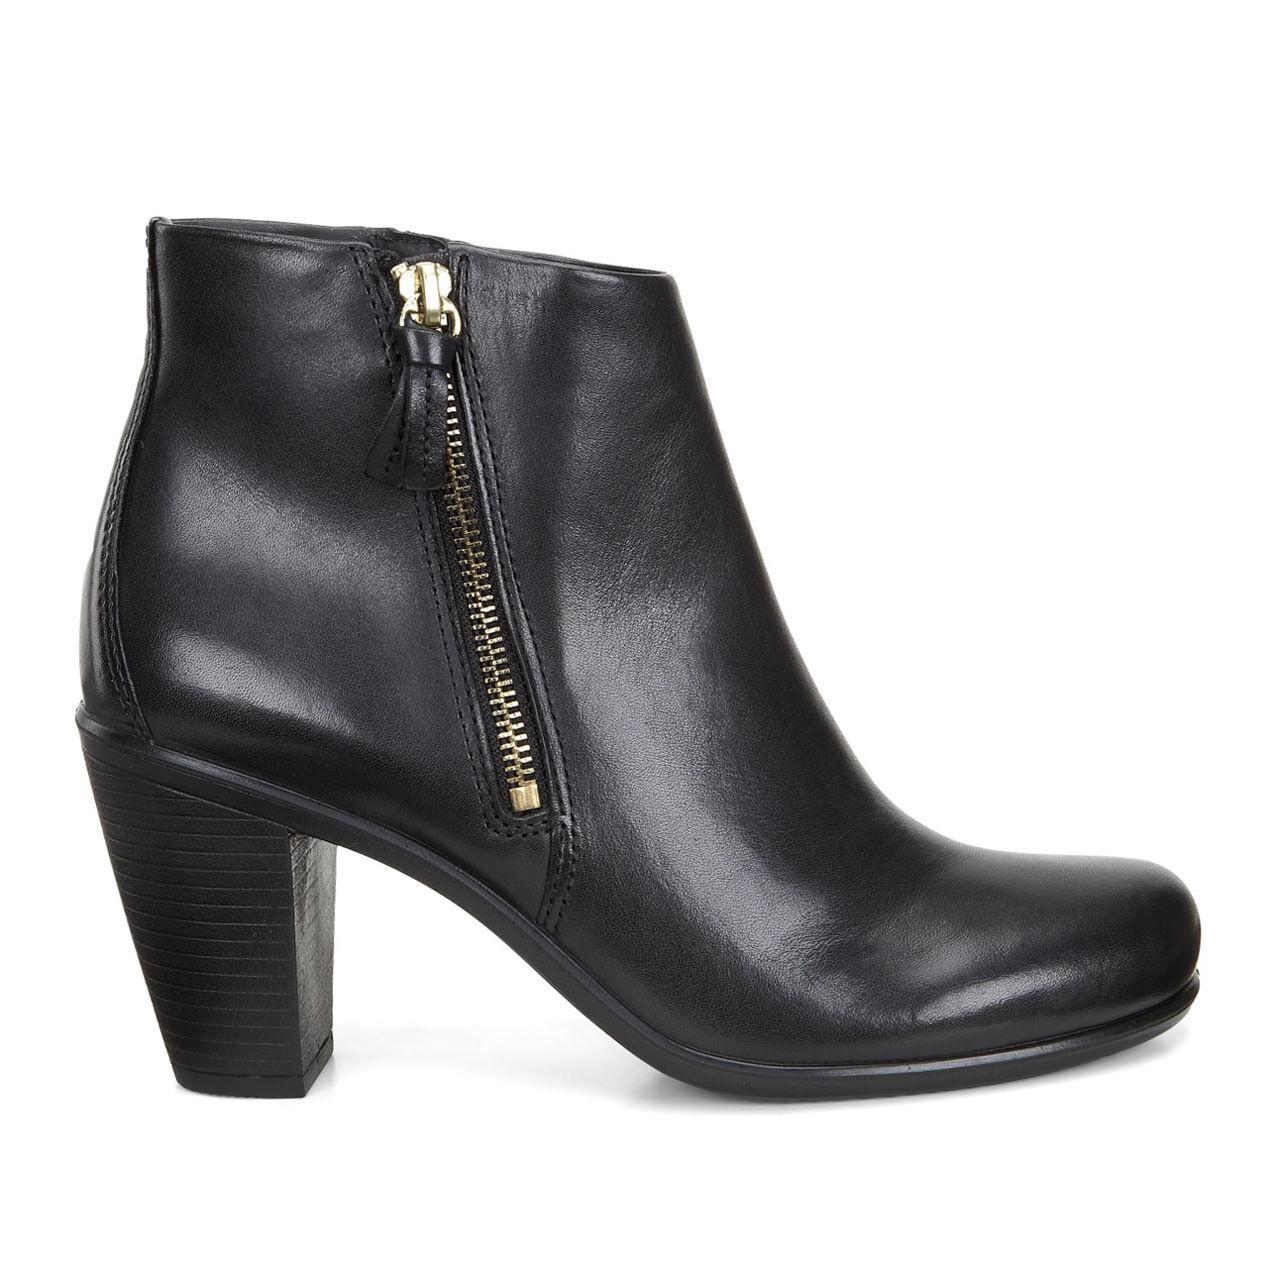 ... ECCO Touch 75 Ankle BootieECCO Touch 75 Ankle Bootie BLACK (01001) ...